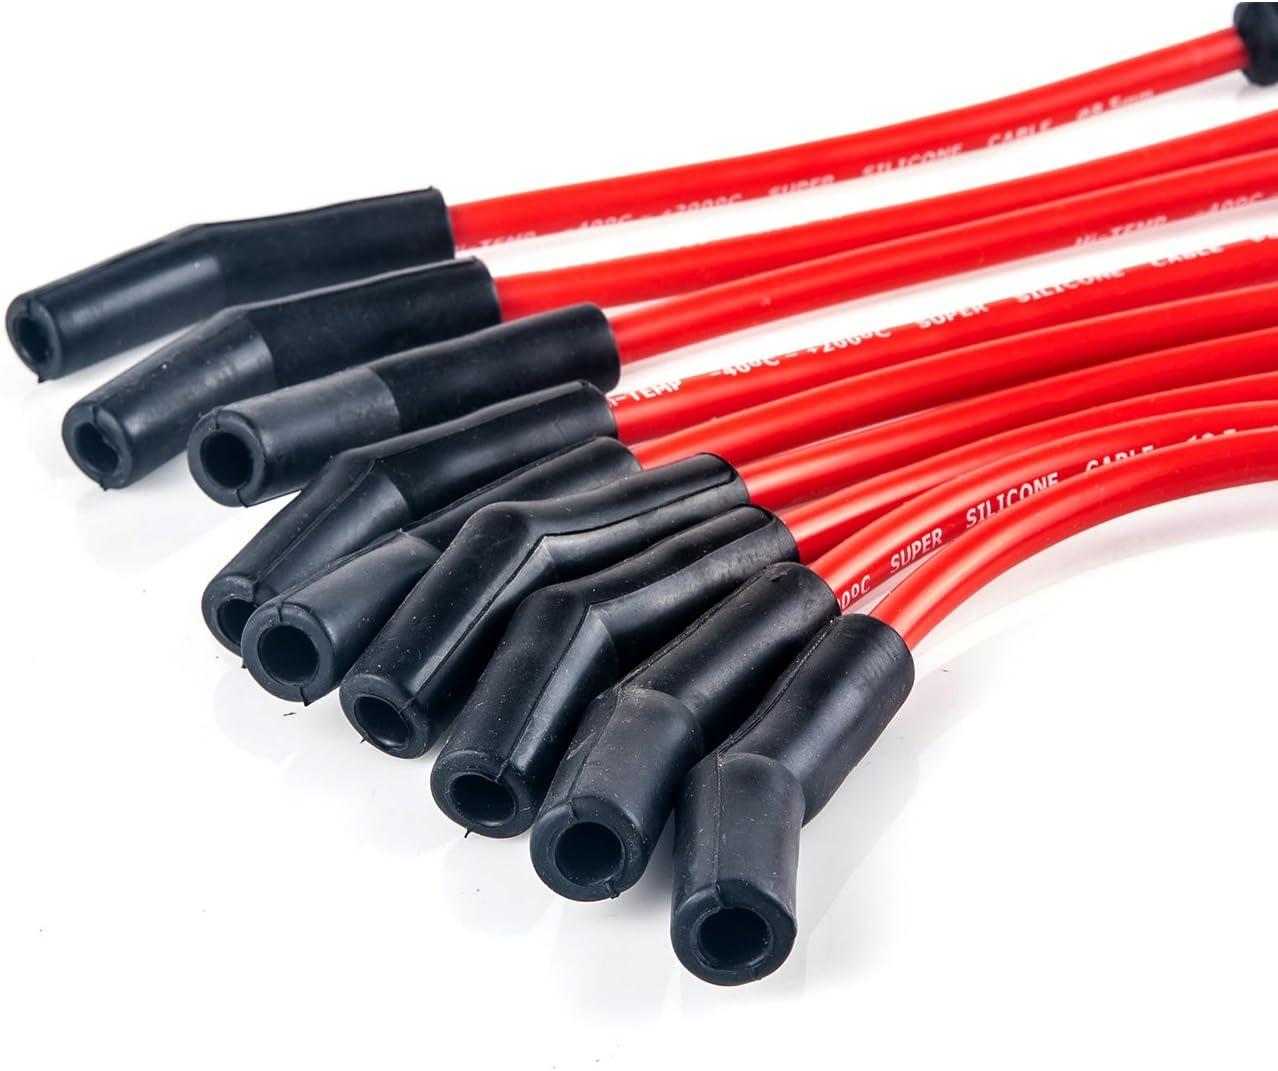 JDMSPEED New 10.5mm JDMSPEED LSx LS1 LS2 LS3 LS6 LS7 High Heat Spark Plug Ignition Wires Set